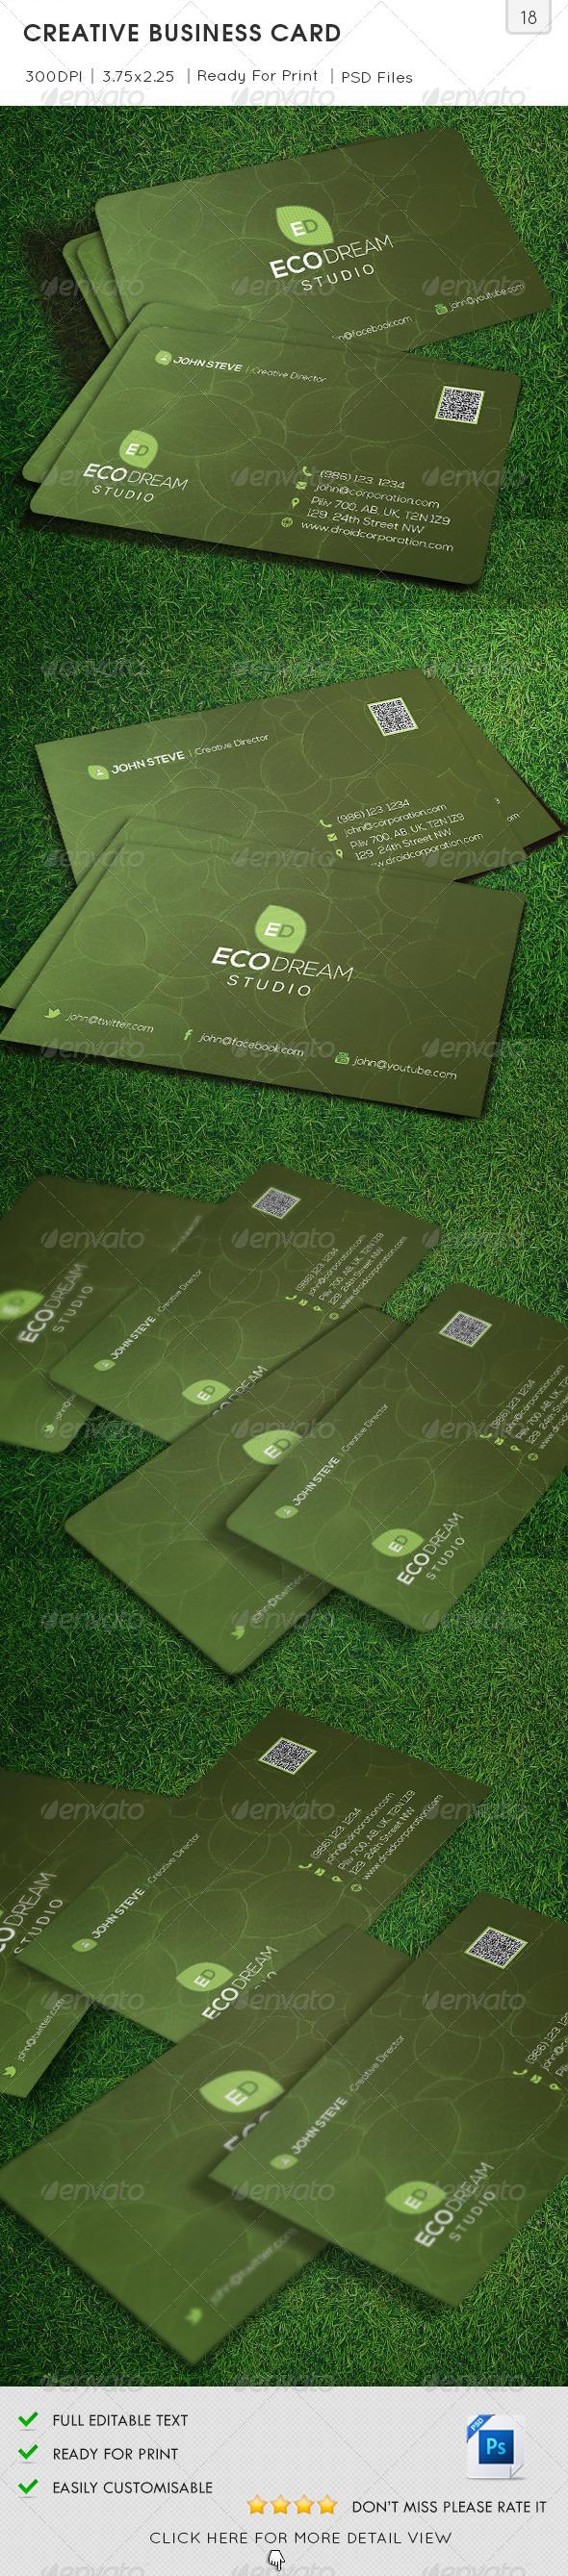 Creative Business Card v18 - Creative Business Cards